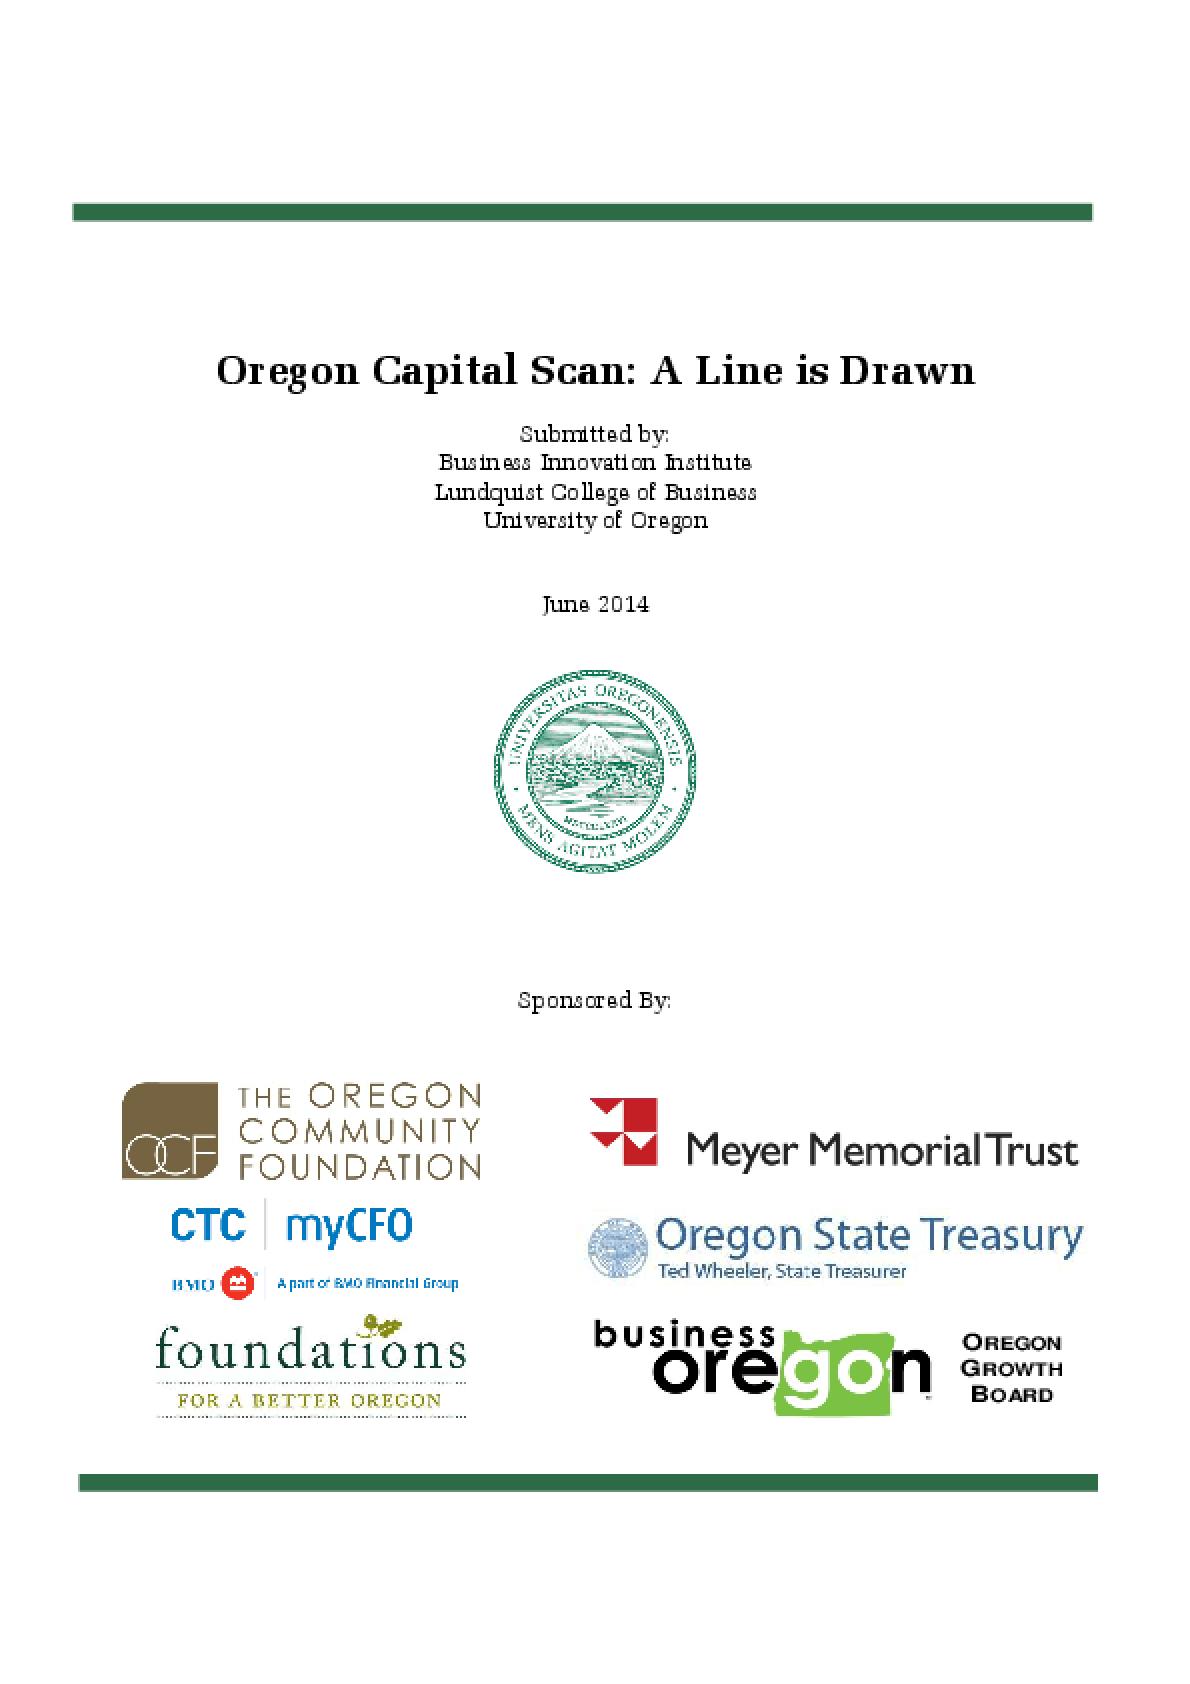 Oregon Capital Scan: A Line is Drawn